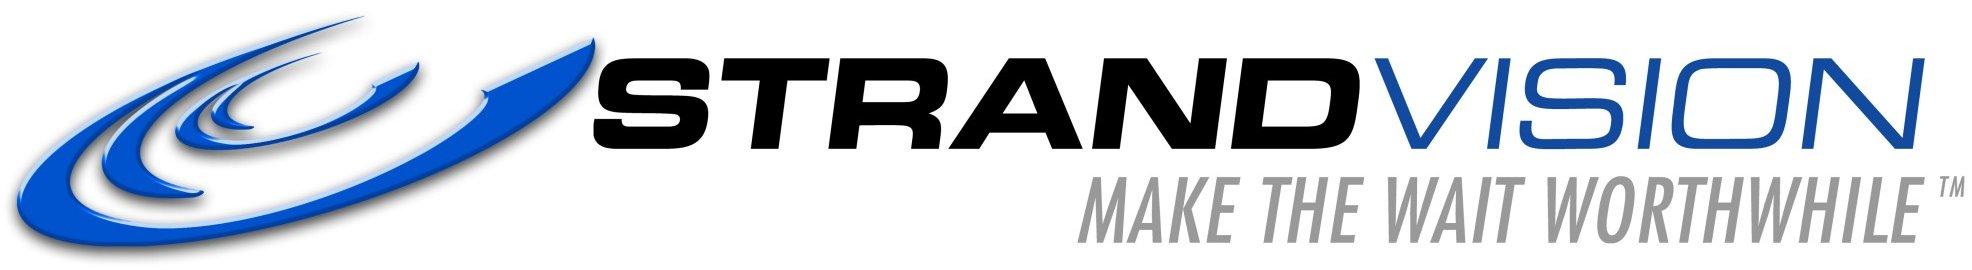 StrandVision Digital Signage